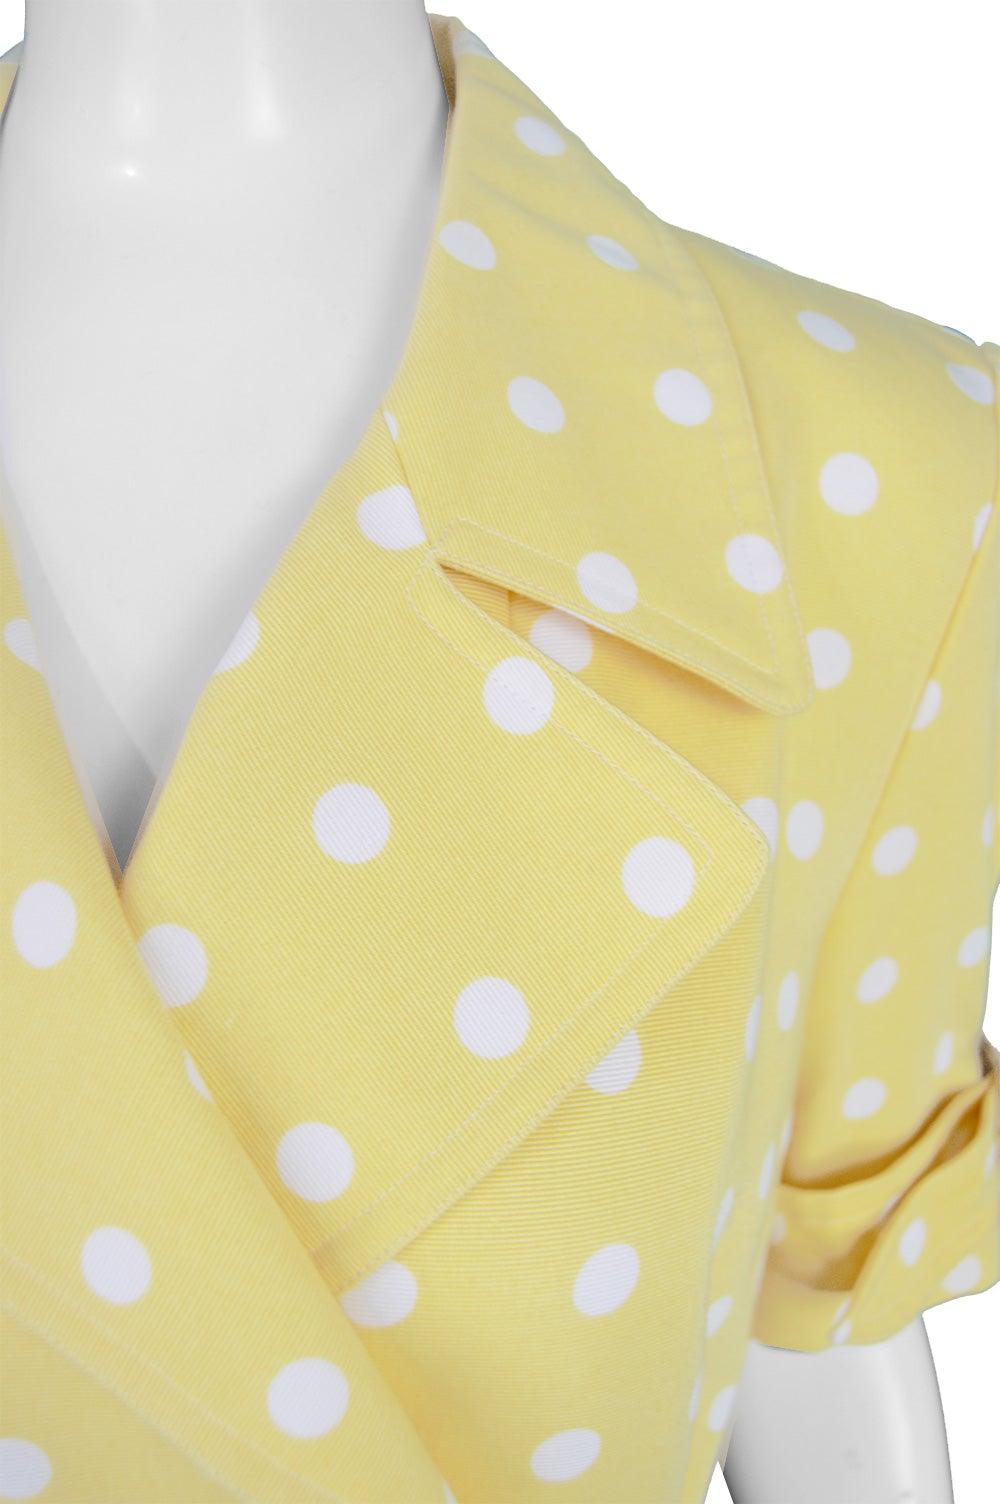 903fd728cf09 Escada Vintage Yellow and White Polka Dot Short Sleeve Trench Coat Dress,  1980s at 1stdibs